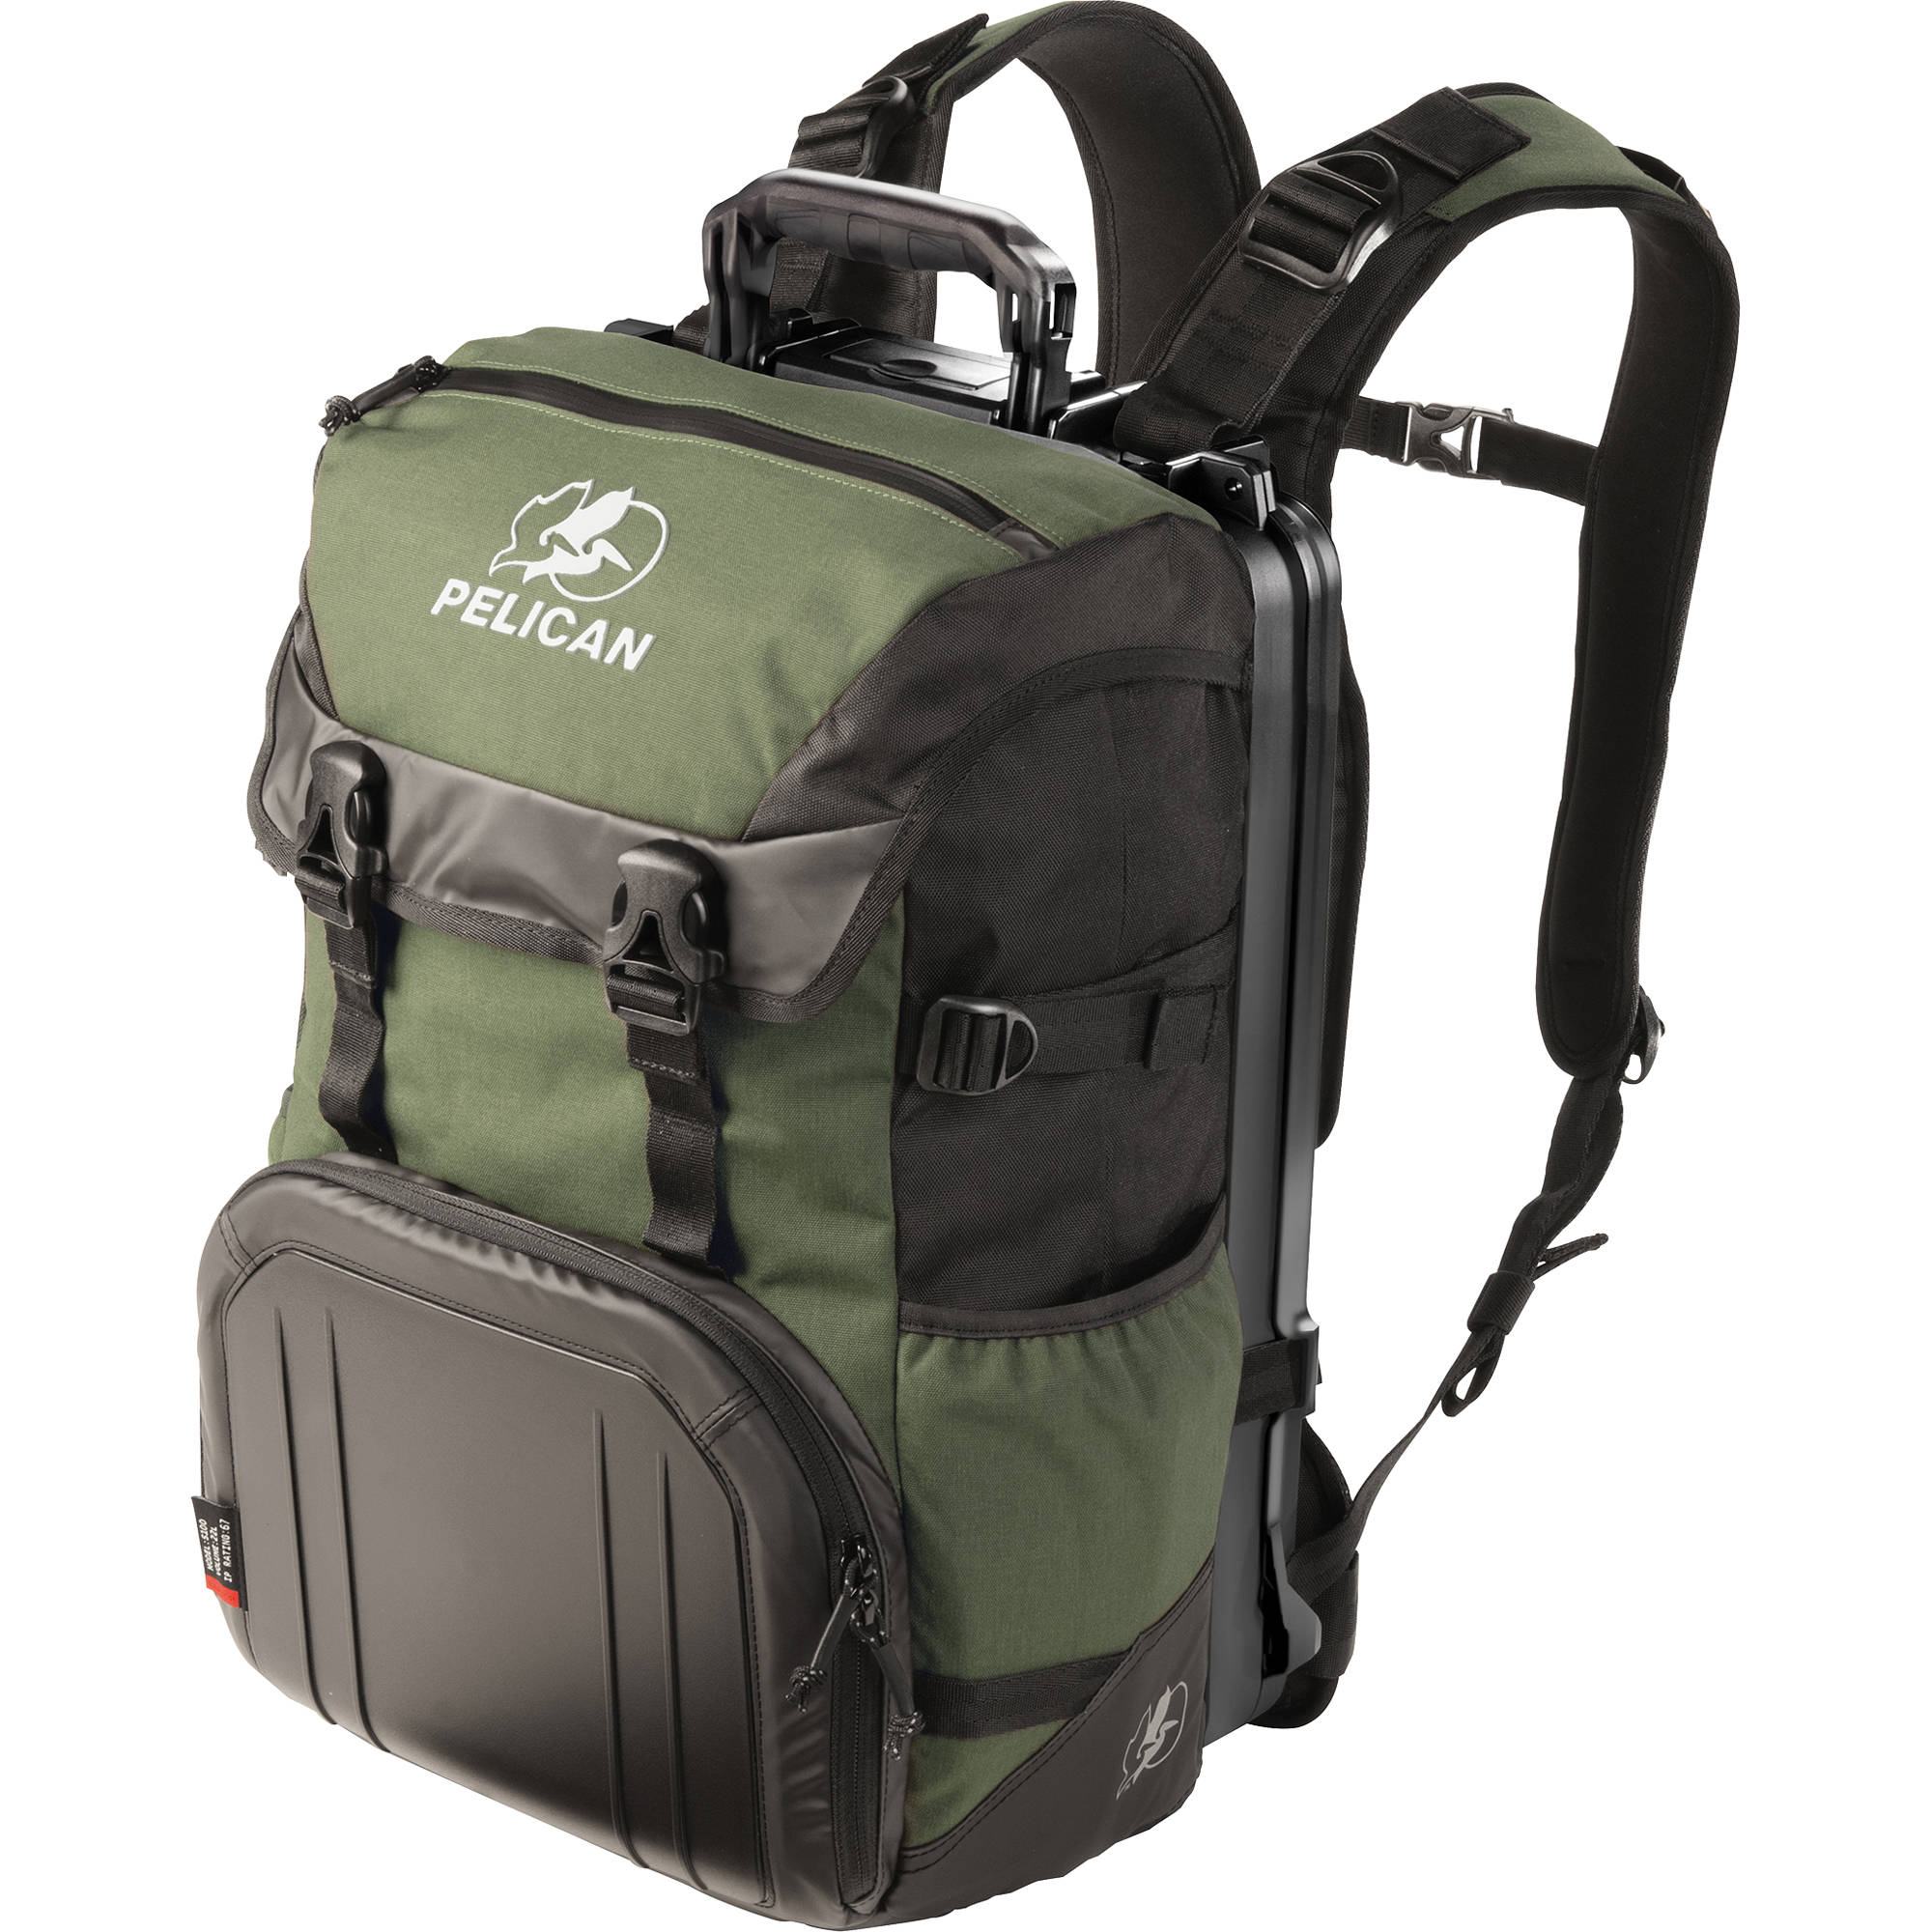 Pelican S100 Sport Elite Laptop Backpack 0s1000 0003 130 B Amp H